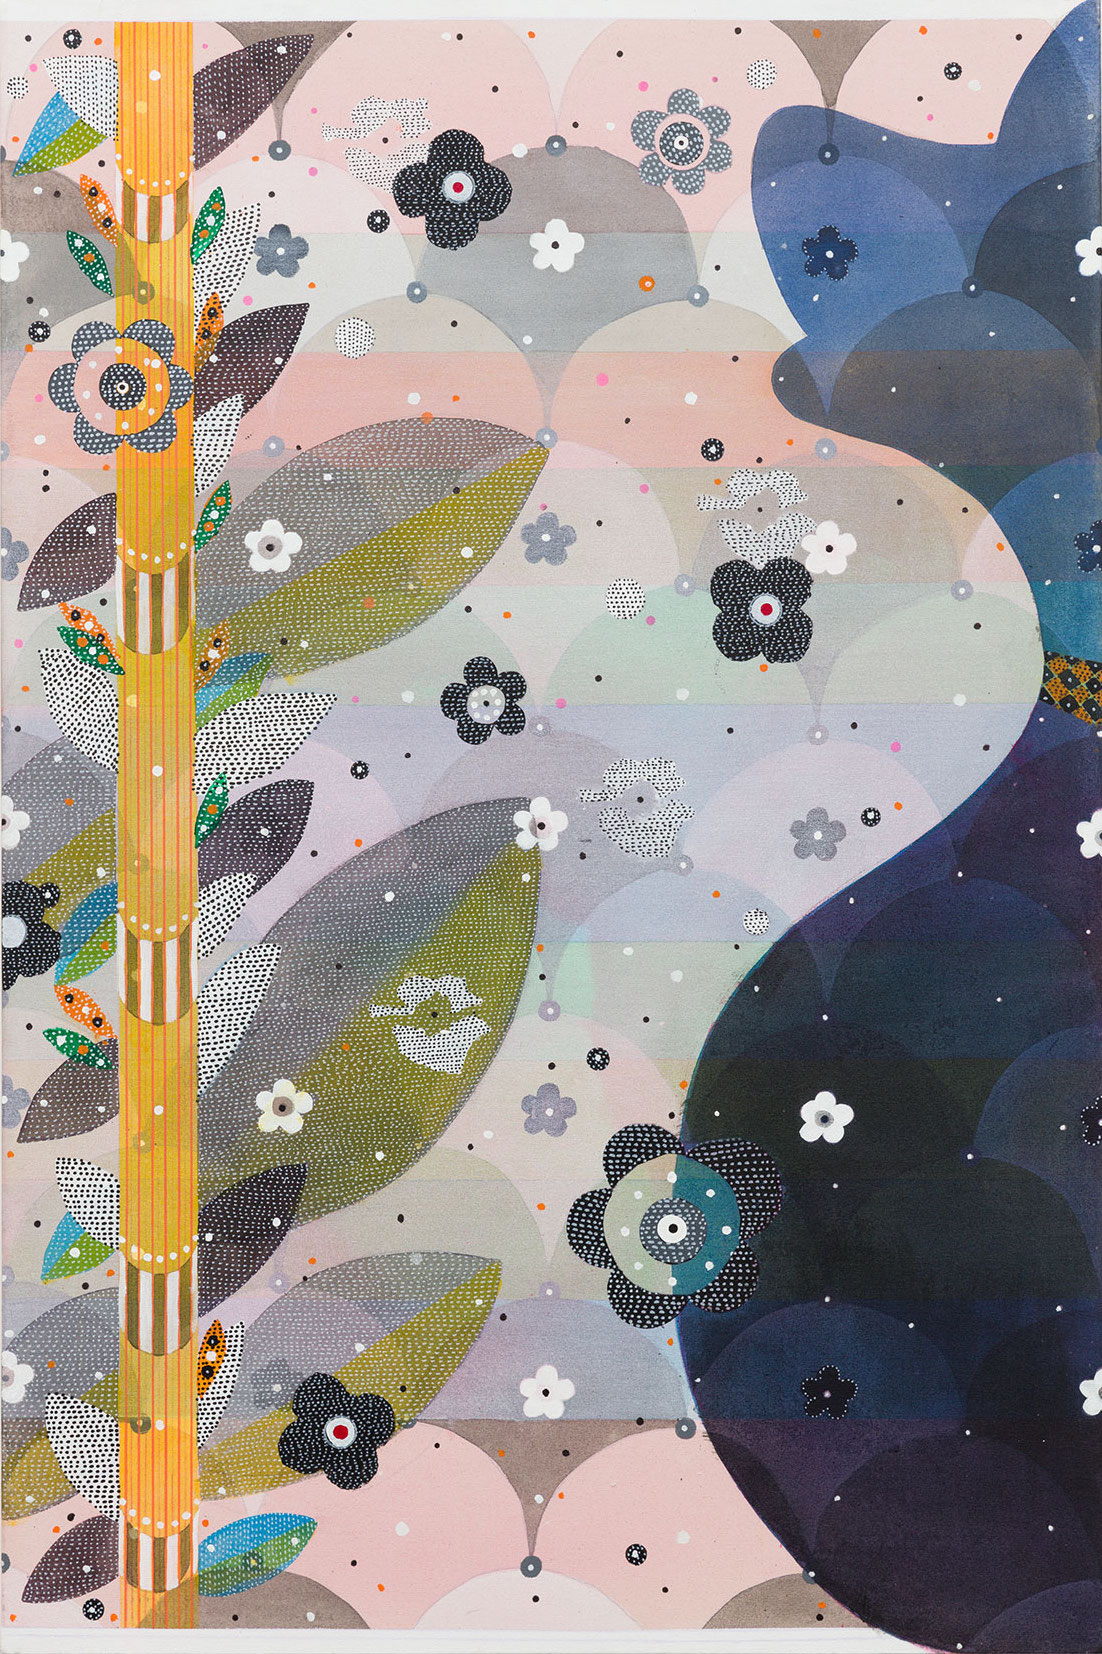 Glenn Goldberg, Glenn Goldberg, Okay (Blue), 2016, acrylic, gesso, ink, and pencil on canvas, 60 x 40 inches (courtesy of Charlie James Gallery)